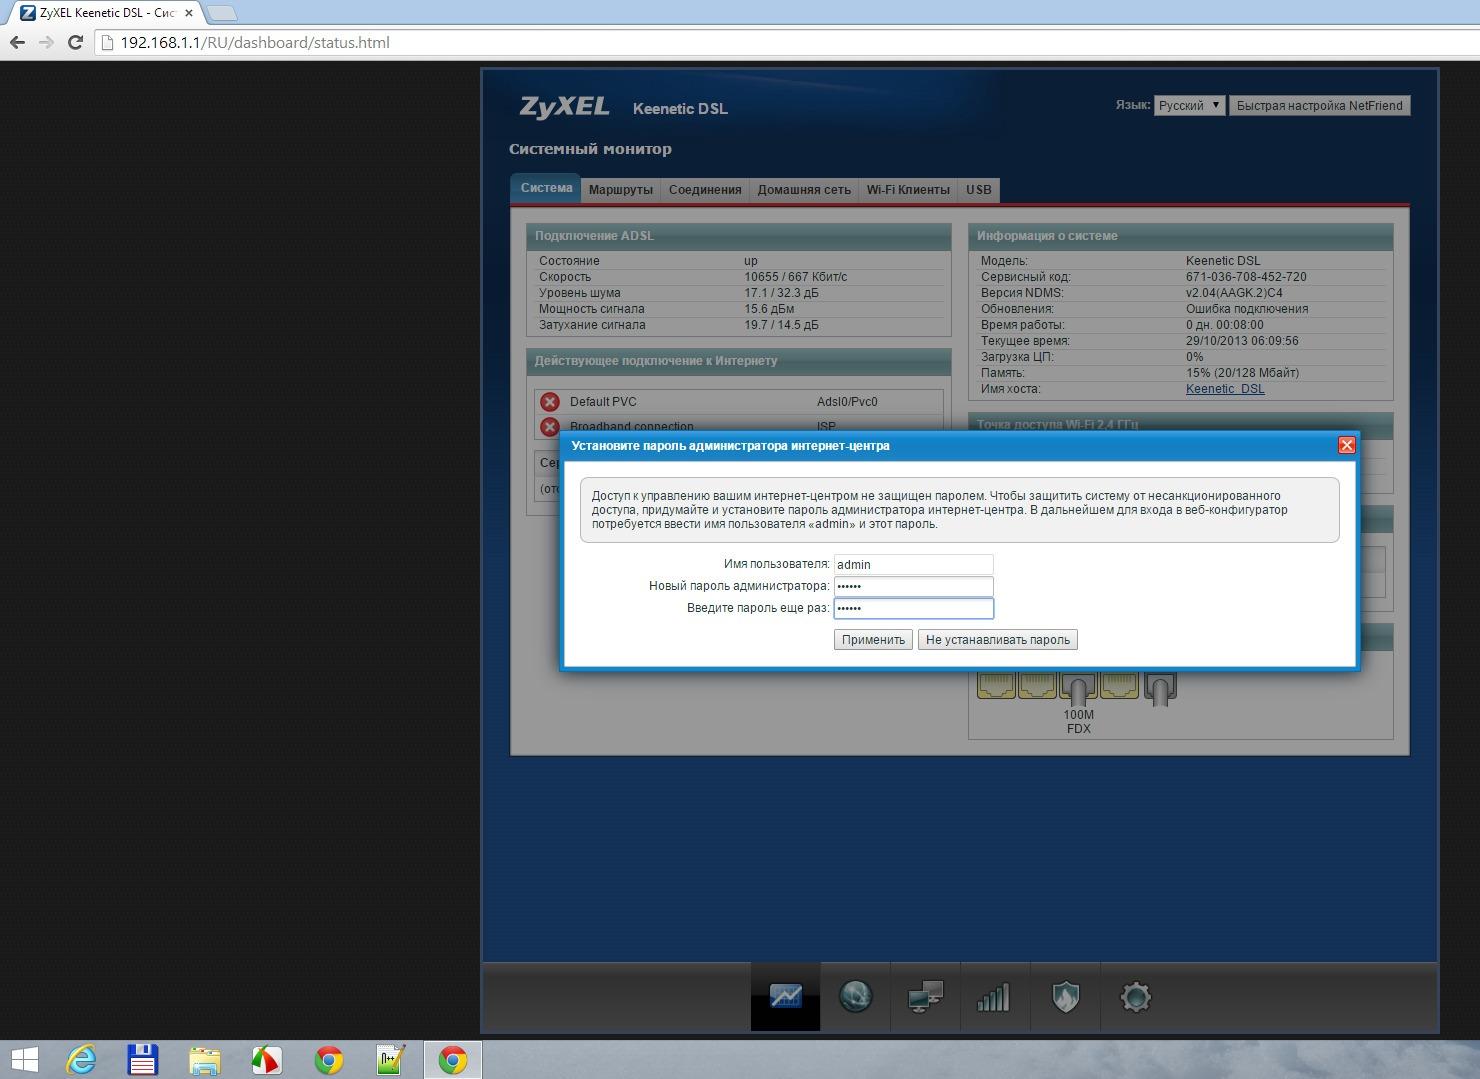 Установка пароля администратора ZyXel Keenetic